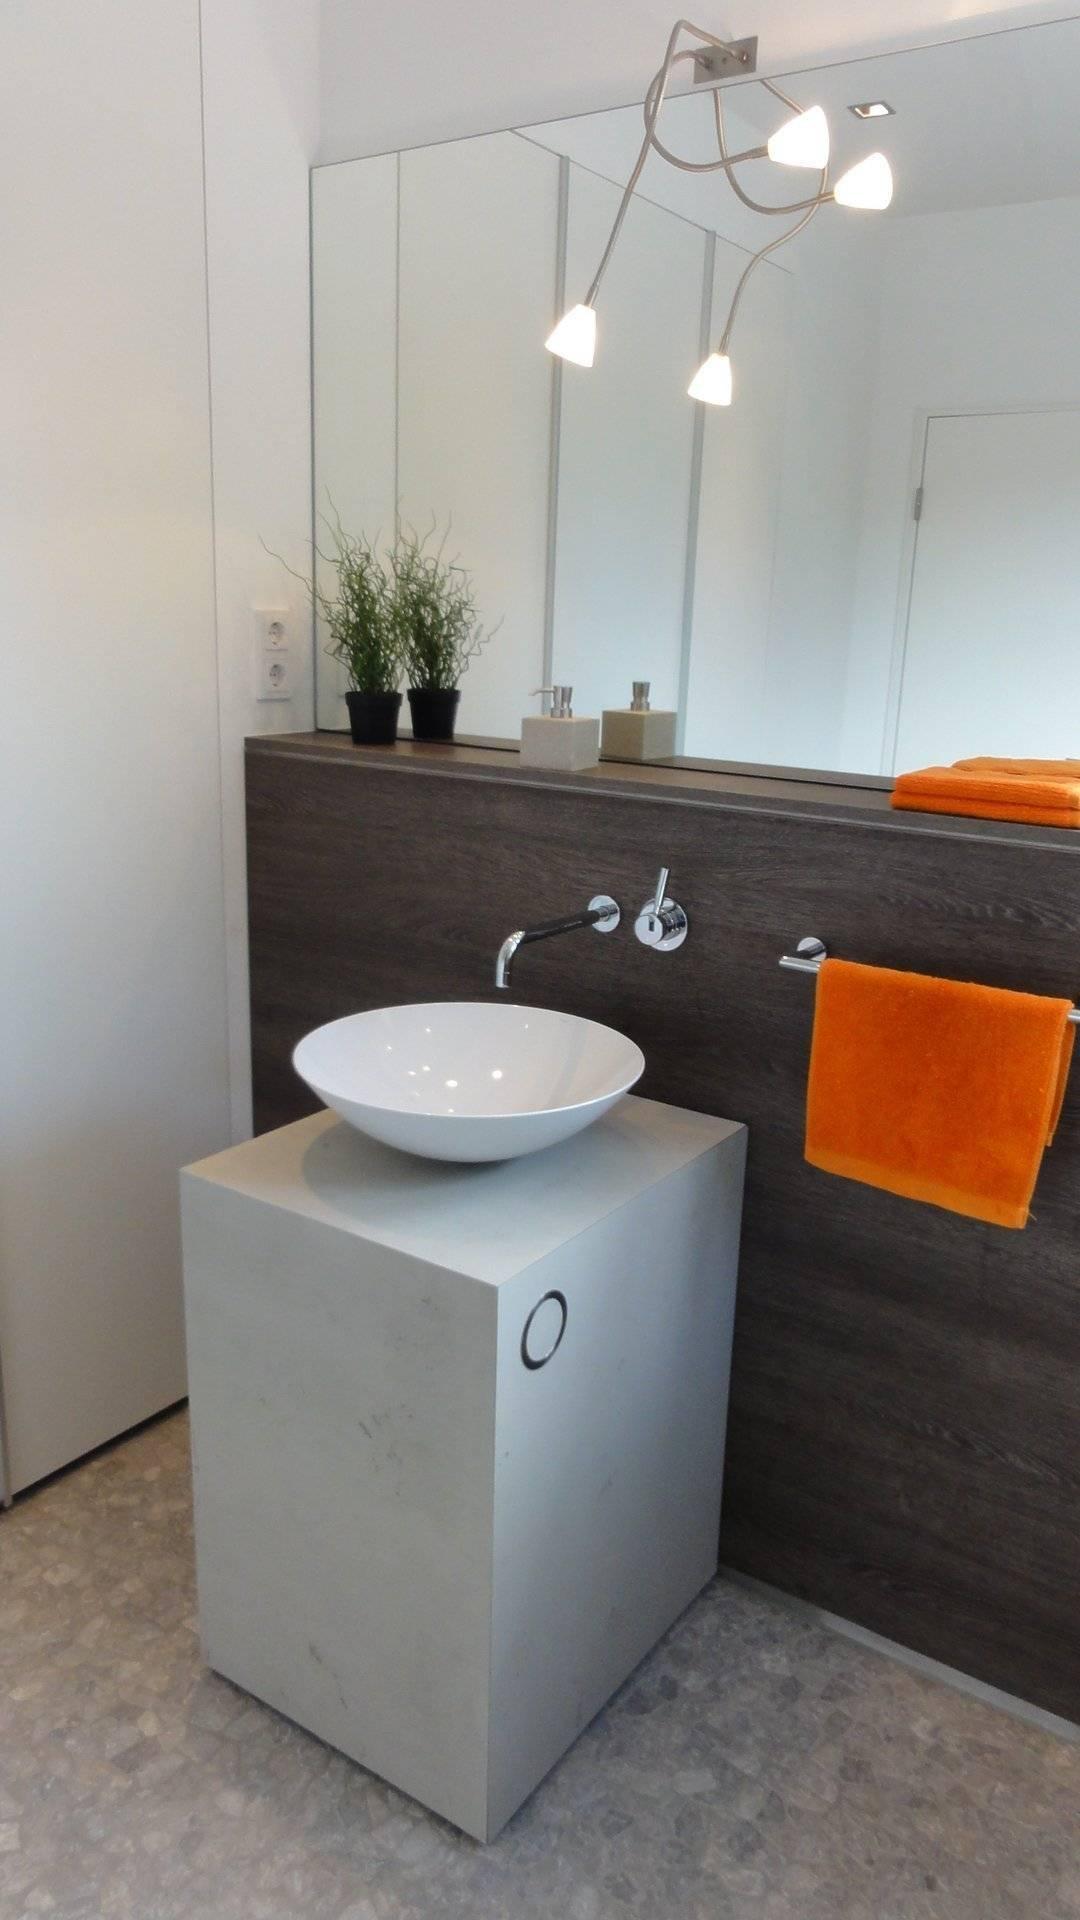 private b der por pfriem innenarchitektur homify. Black Bedroom Furniture Sets. Home Design Ideas